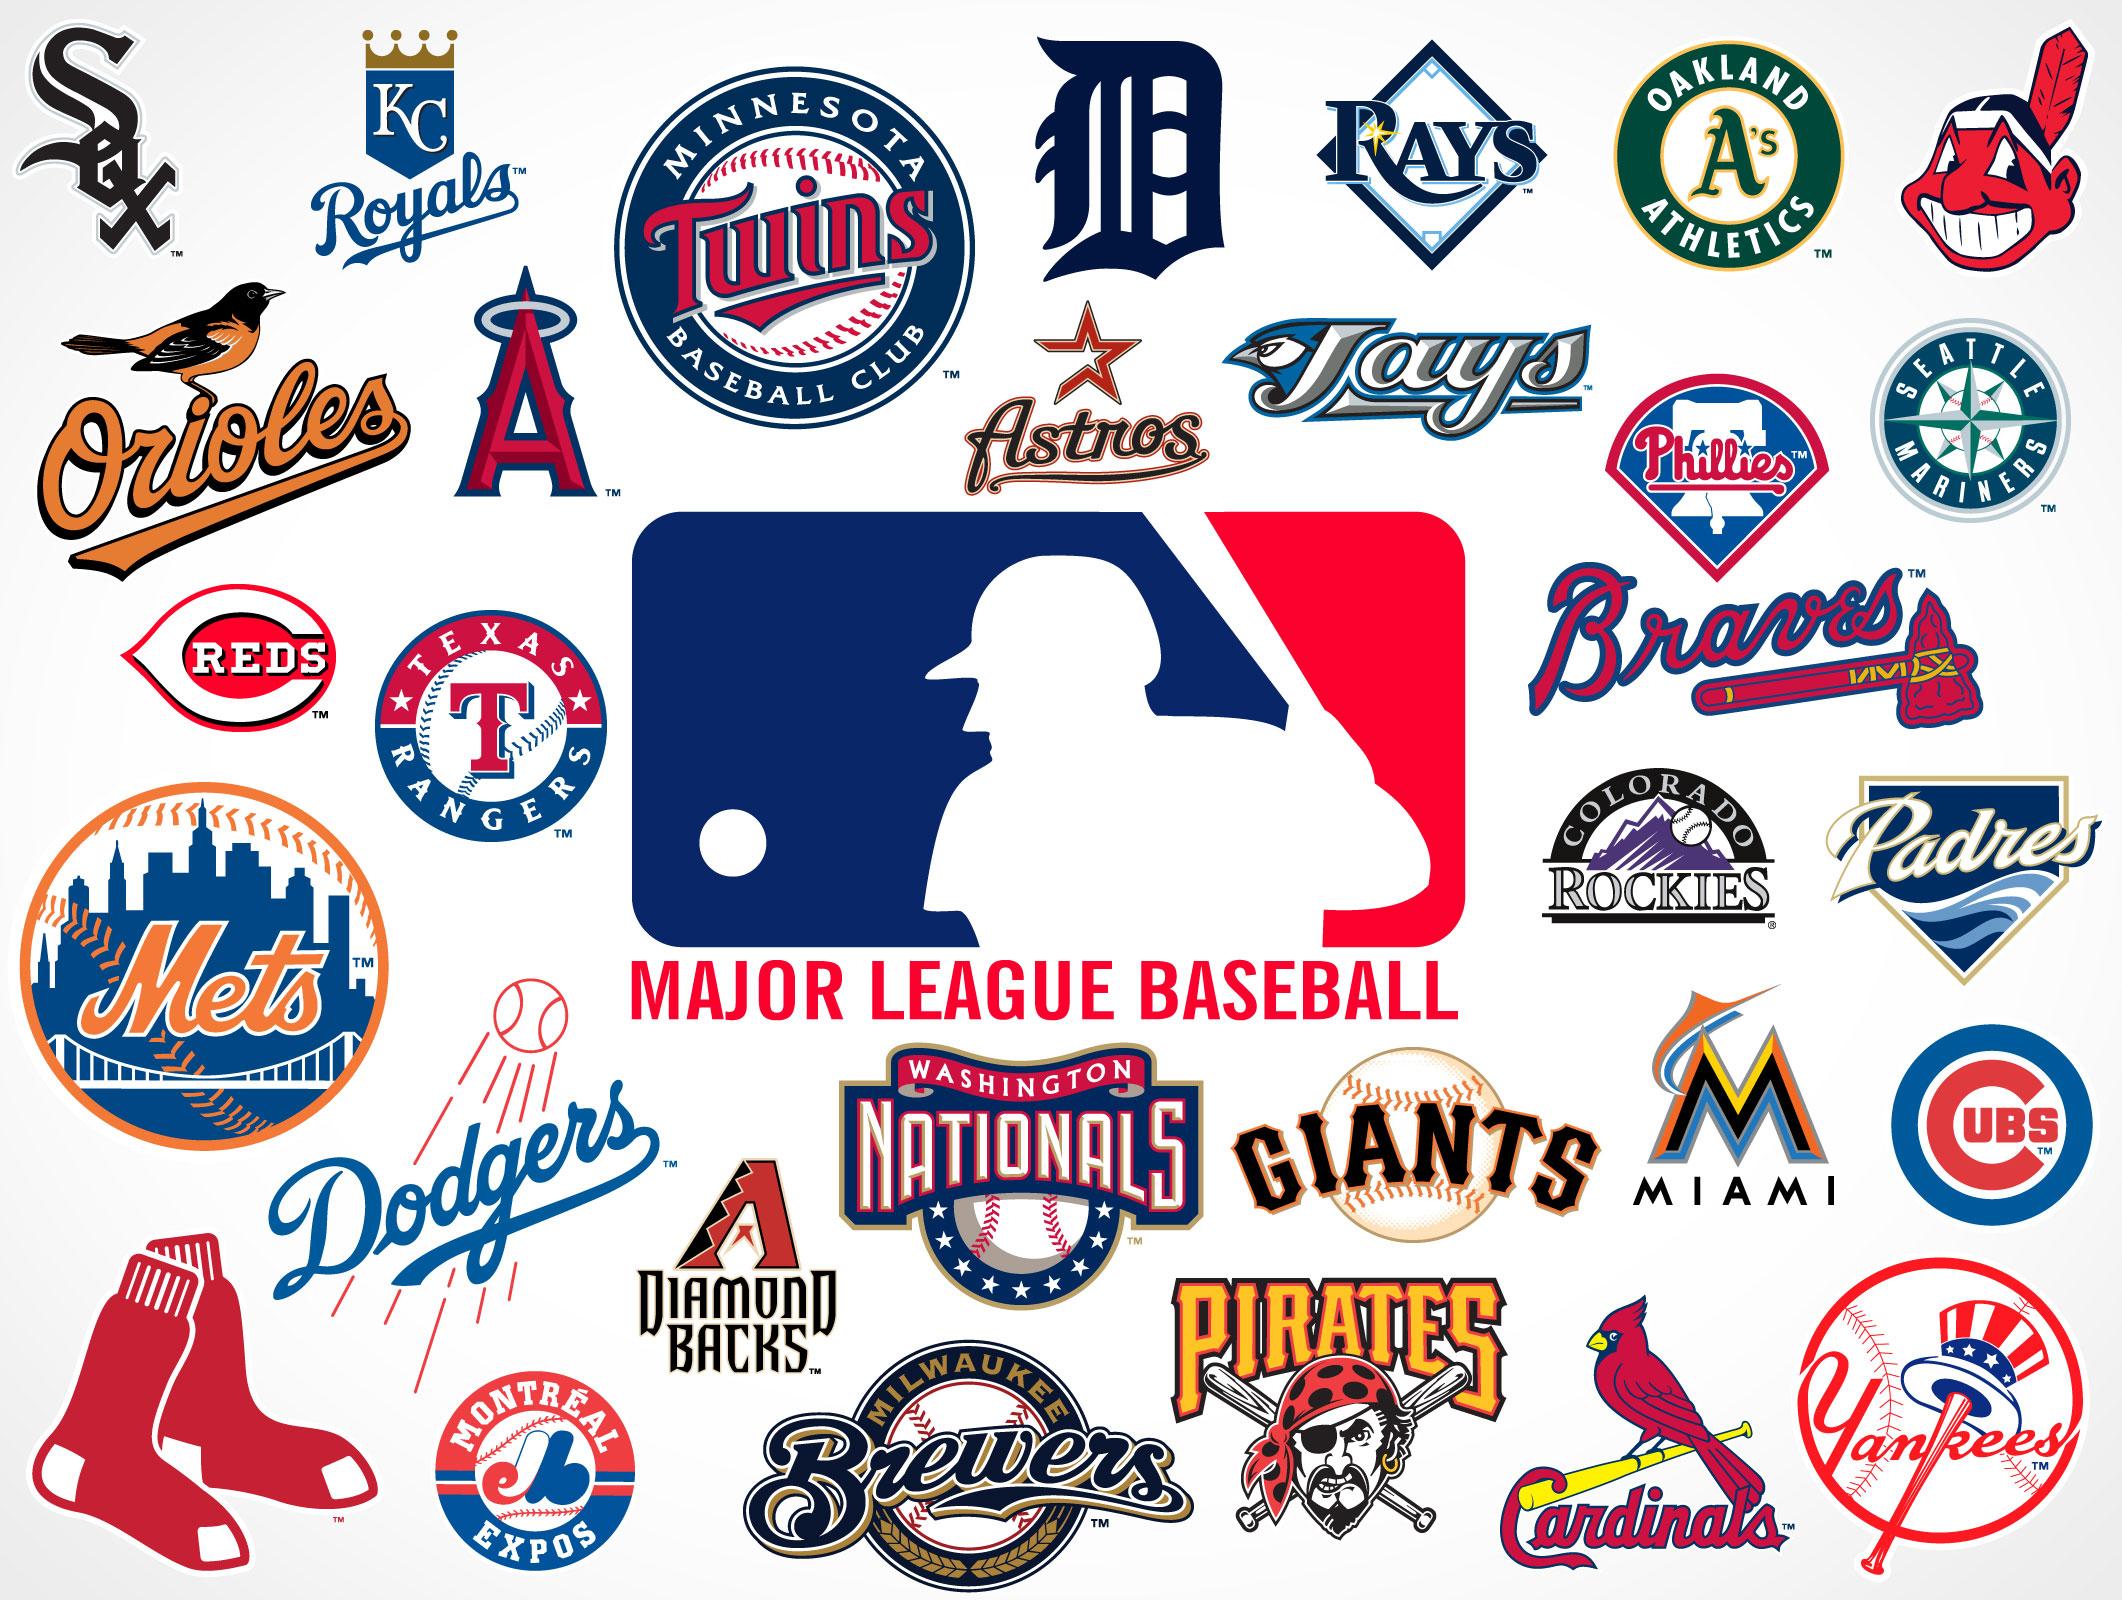 Major League Baseball Team Logos Market Your Psd Mockups For Logos